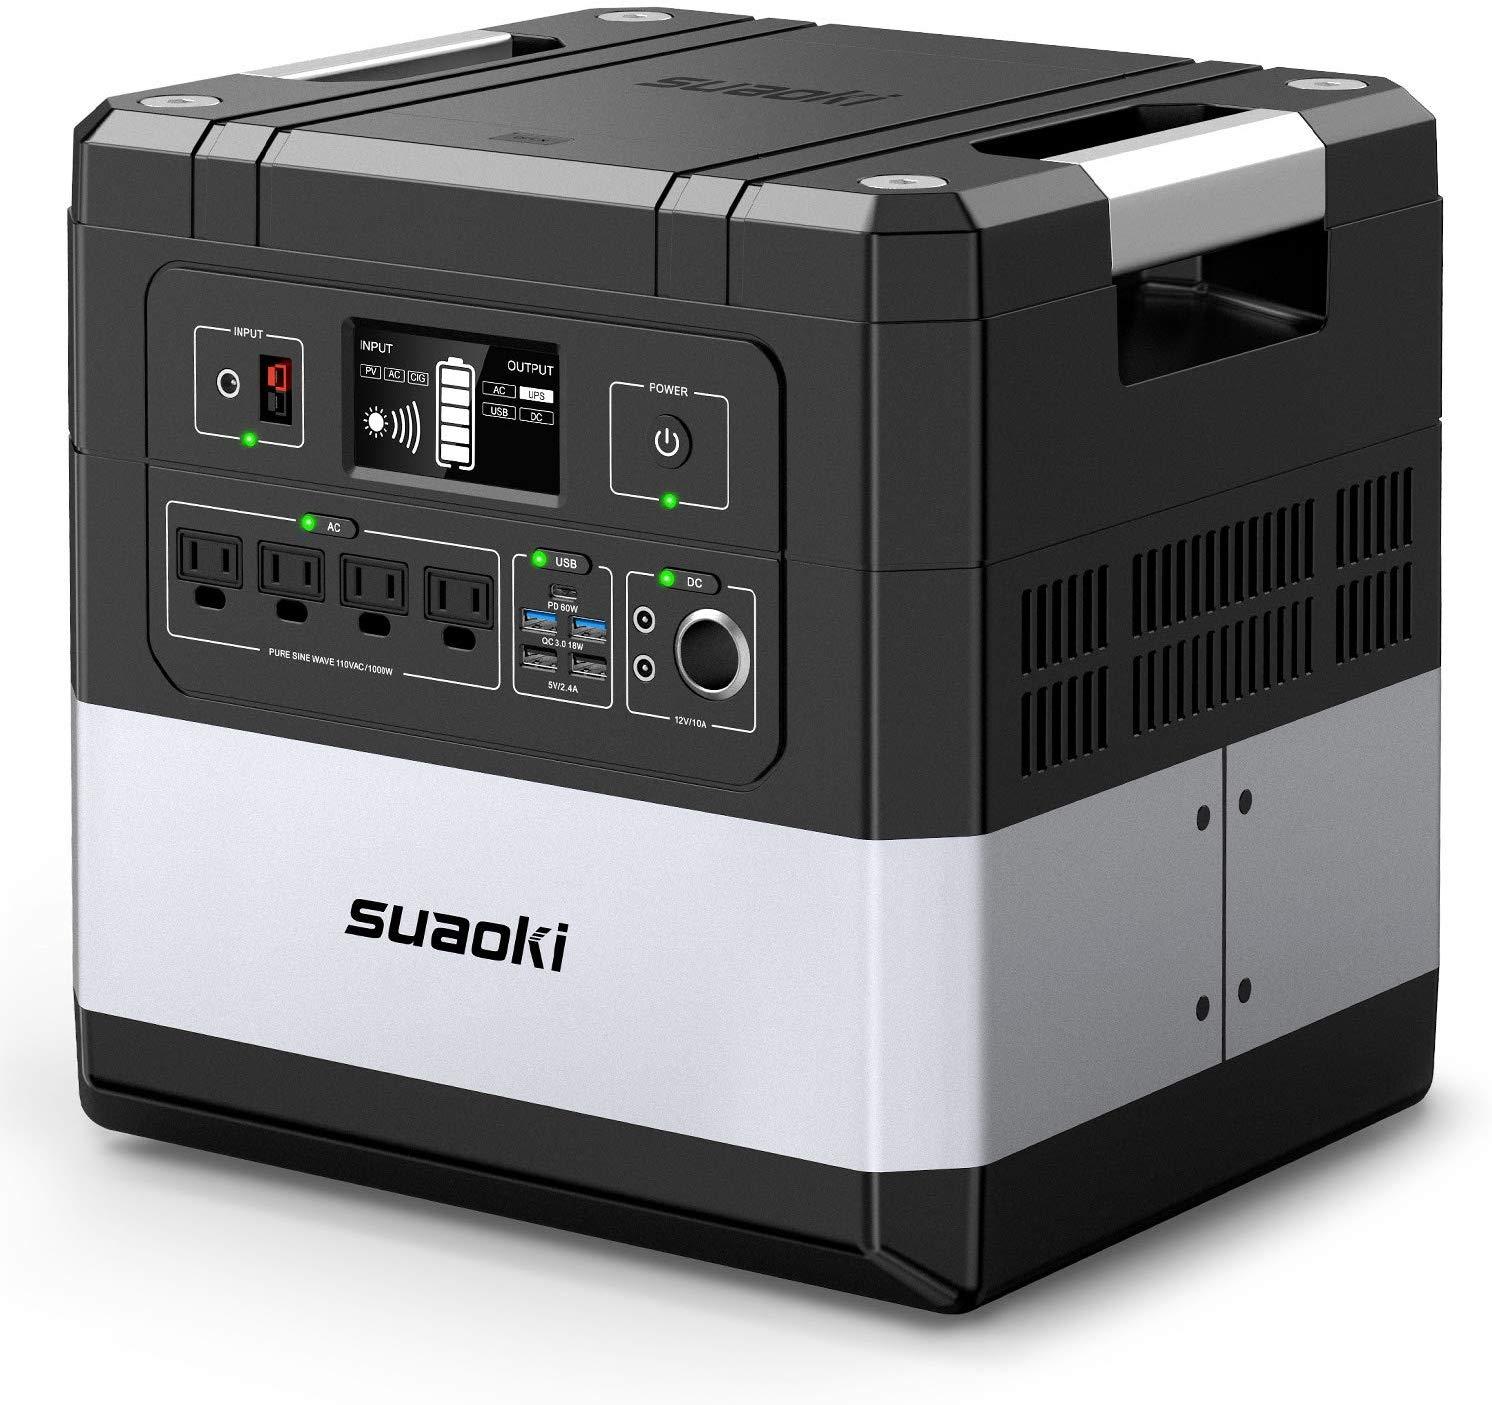 SUAOKI UPS Power Station, G1000